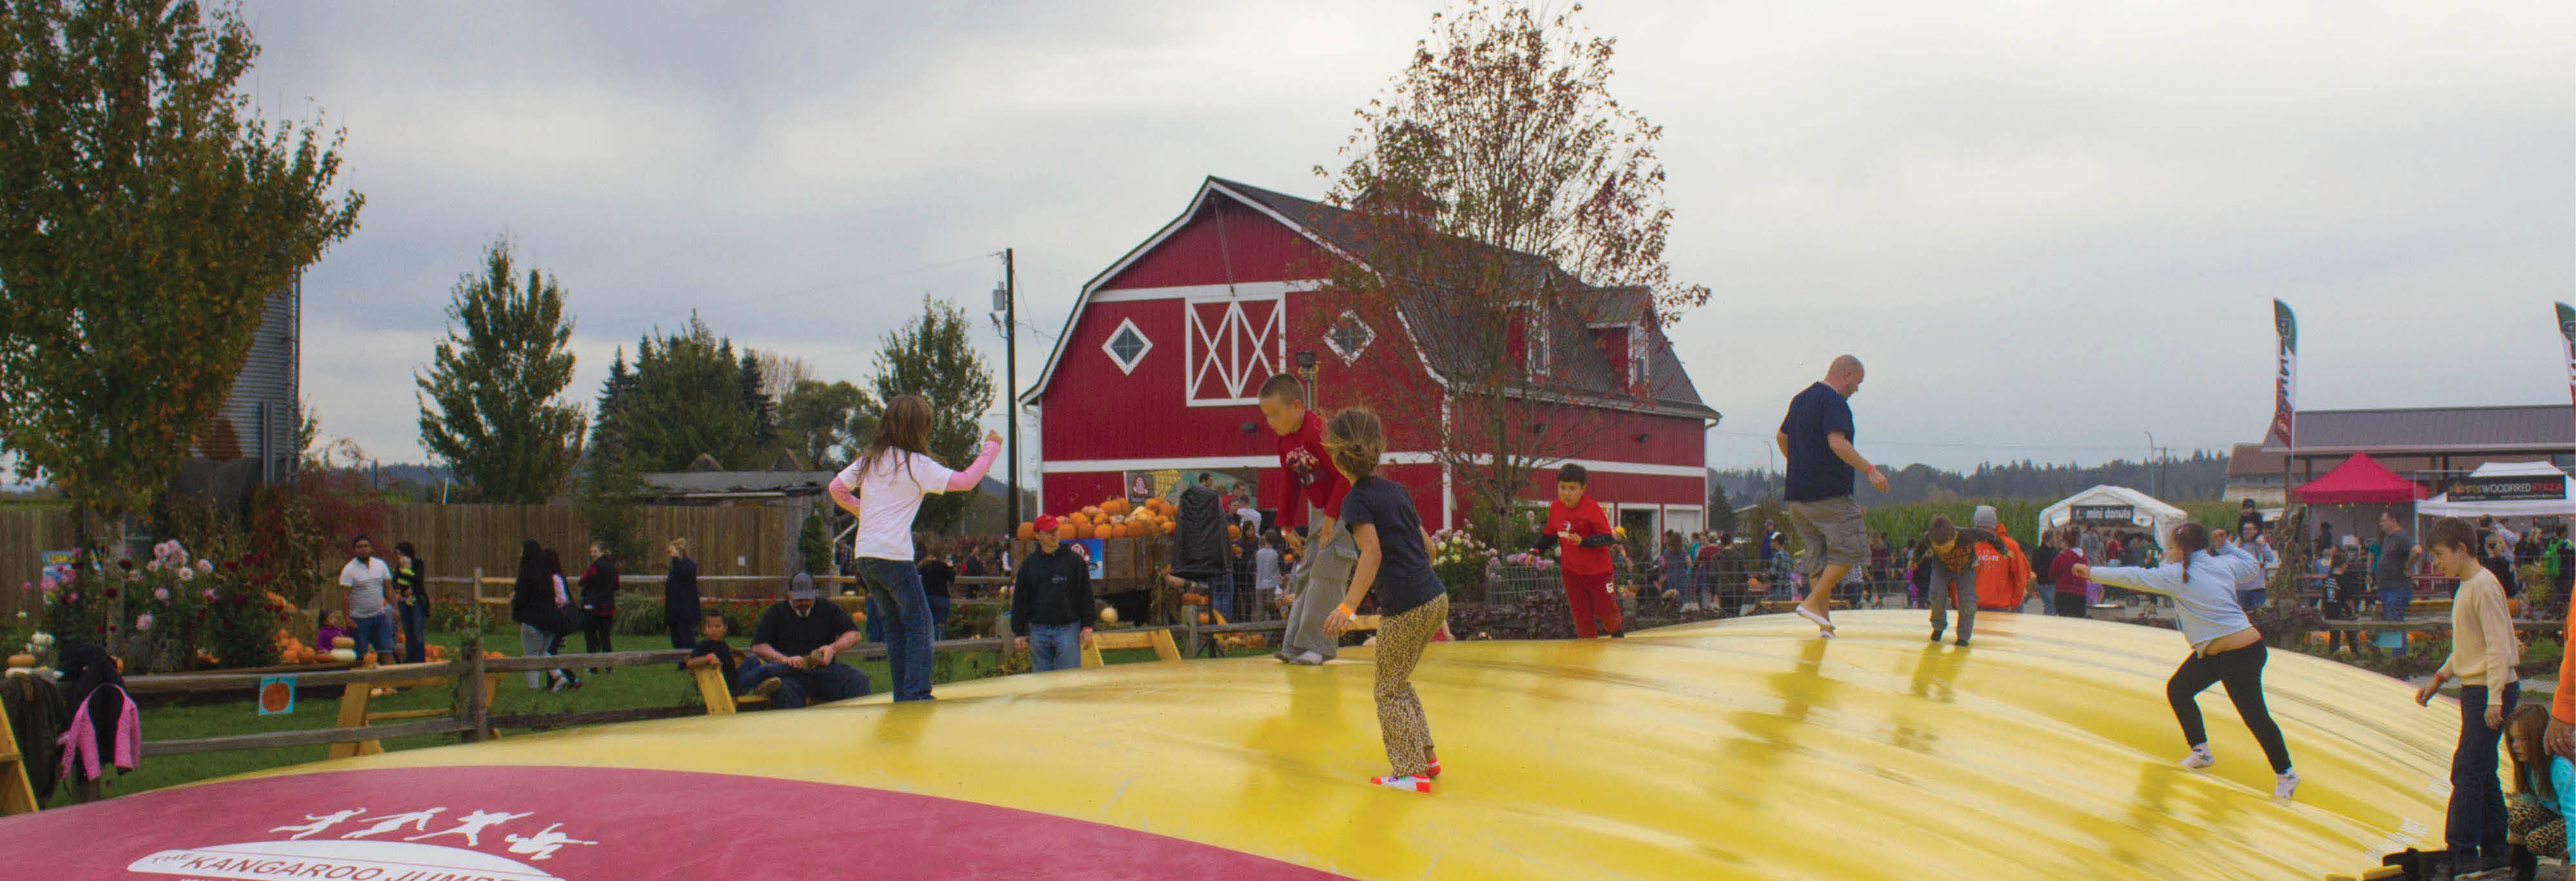 Stocker Farms main banner image - Family Adventure Farm - Snohomish, WA